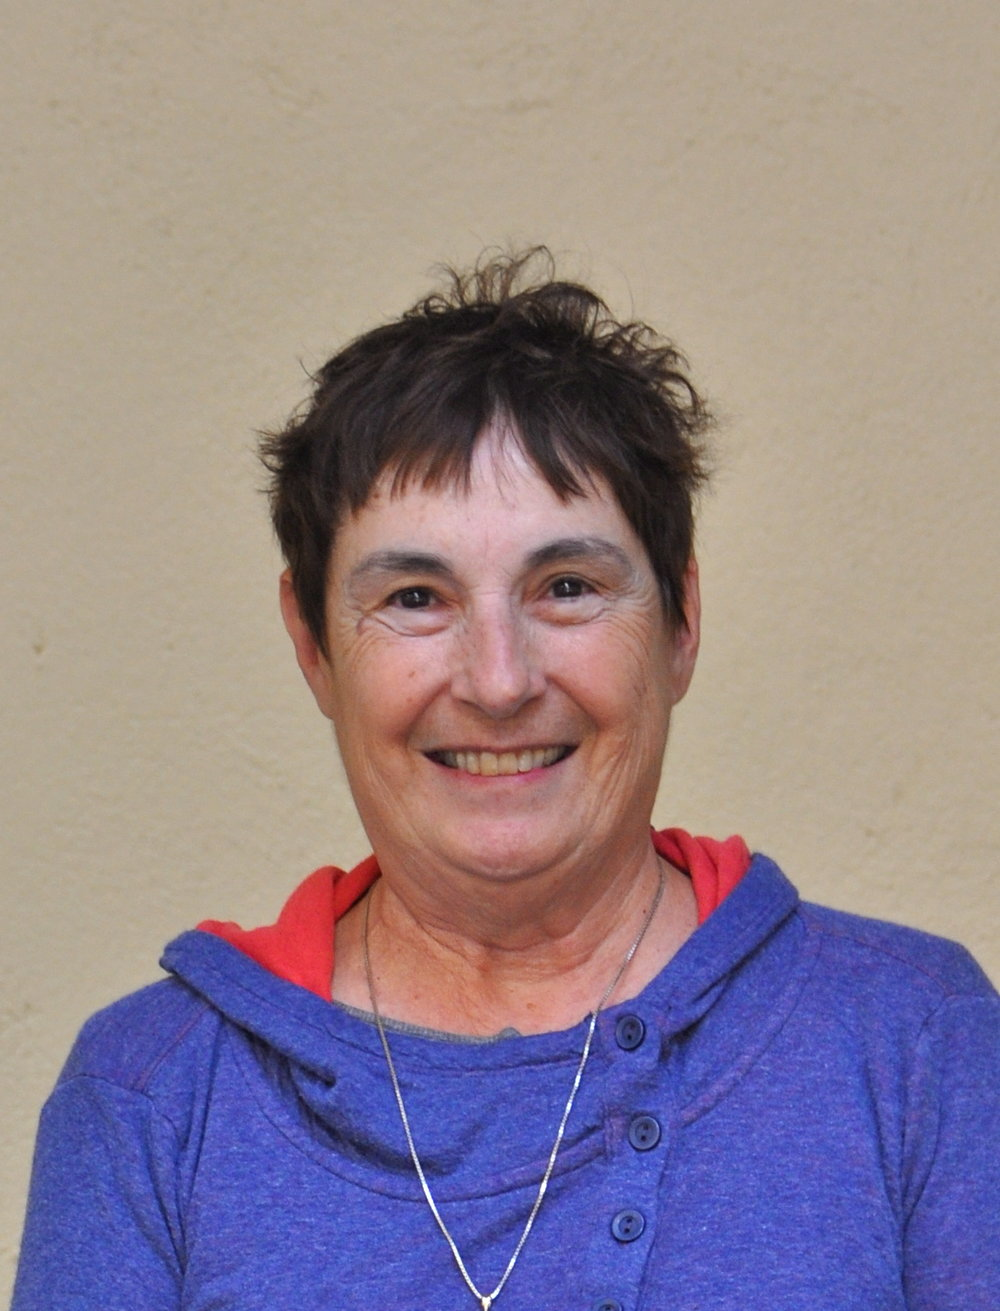 Julie Nunes